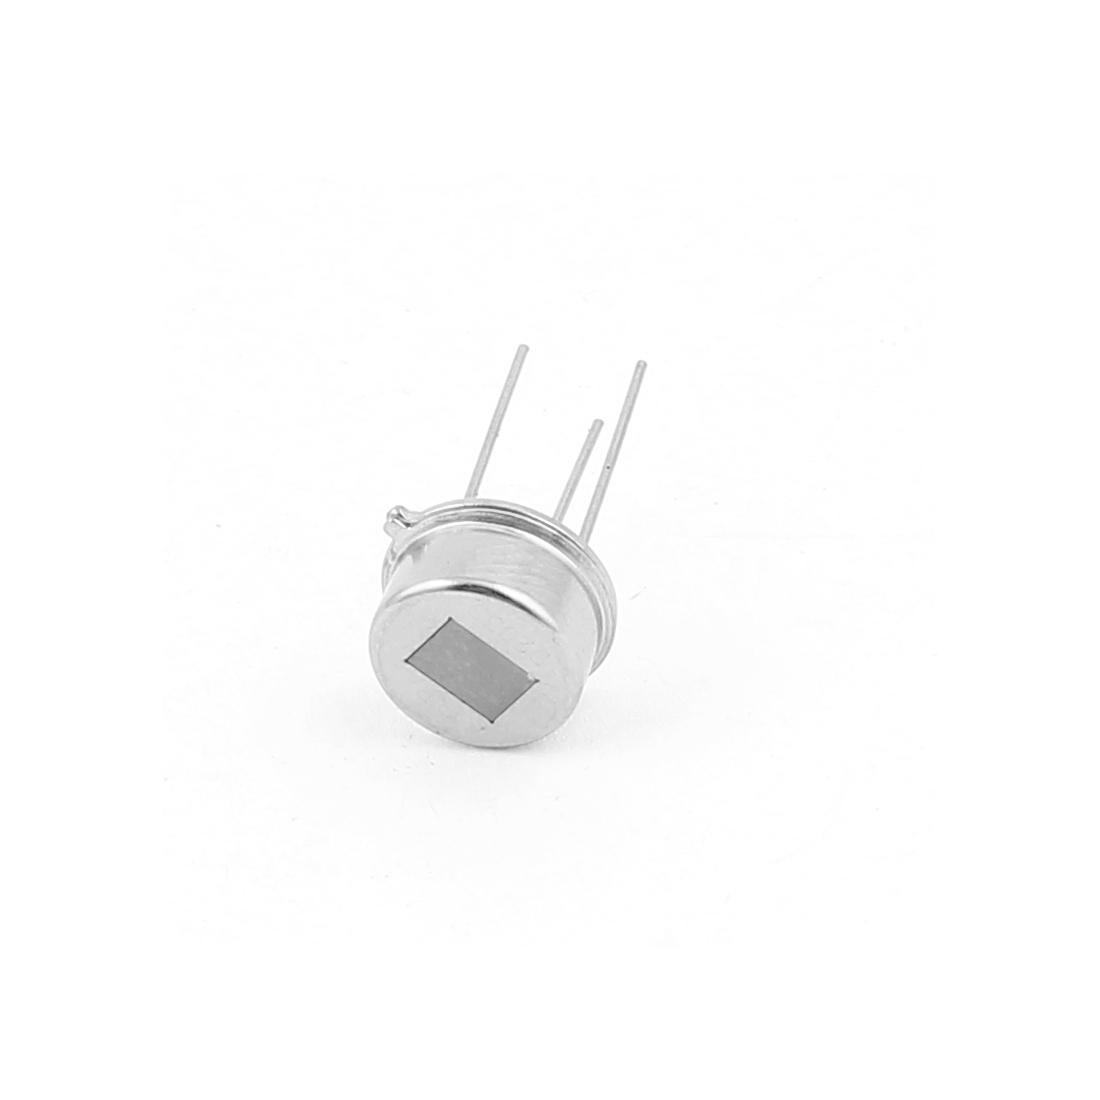 Pyroelectric PIR Infrared Radial Sensor Human Motion Detector D203S